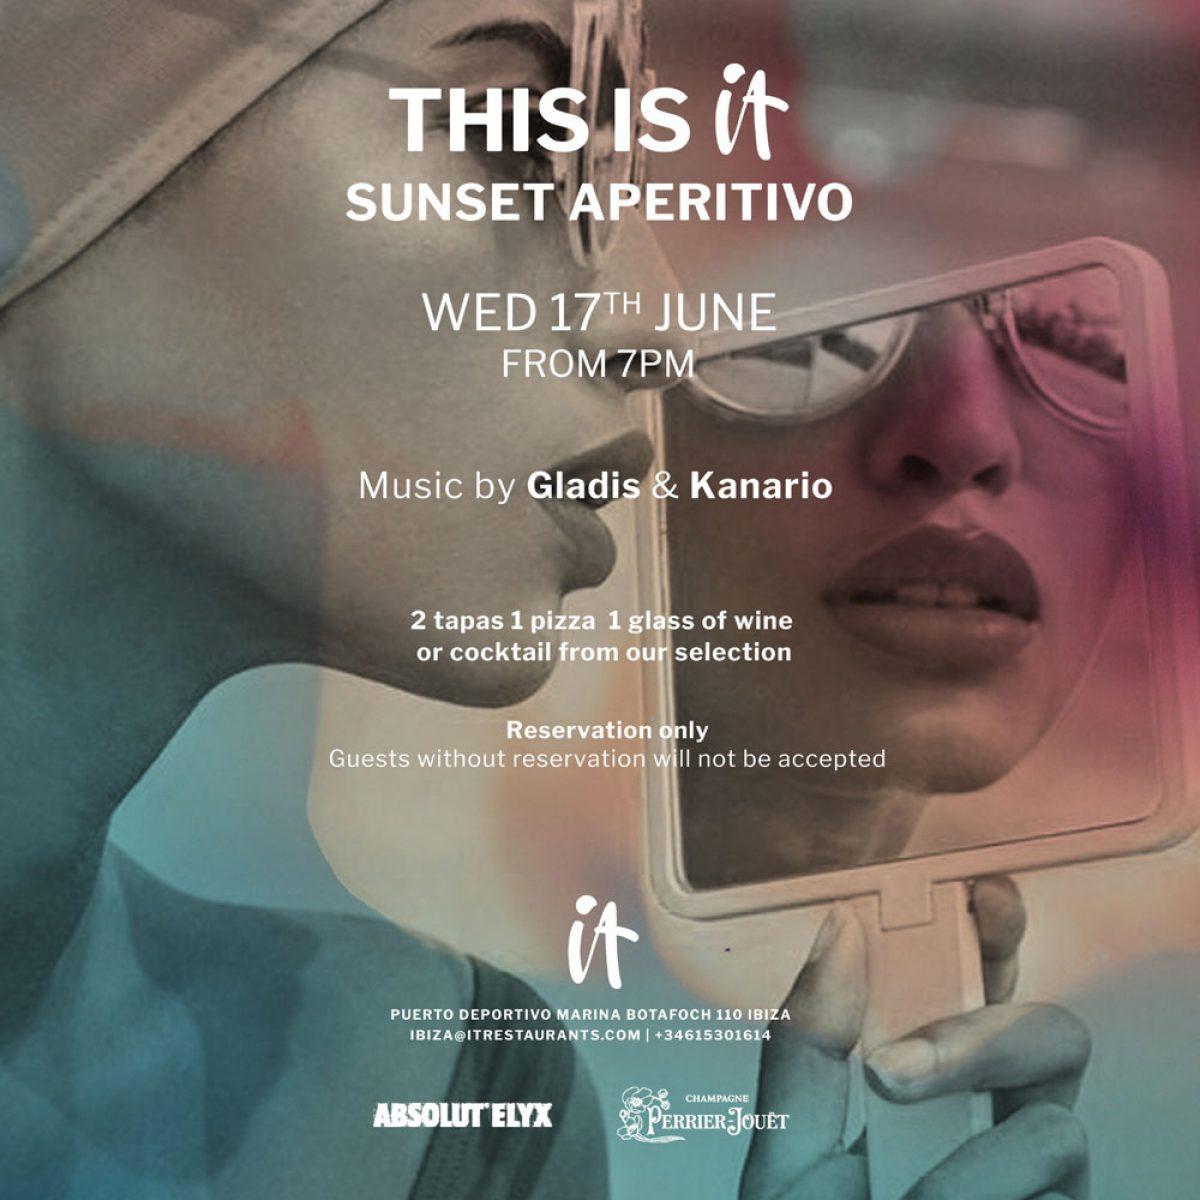 restaurant-it-ibiza-this-is-it-sunset-aperitivo-2020-welcometoibiza